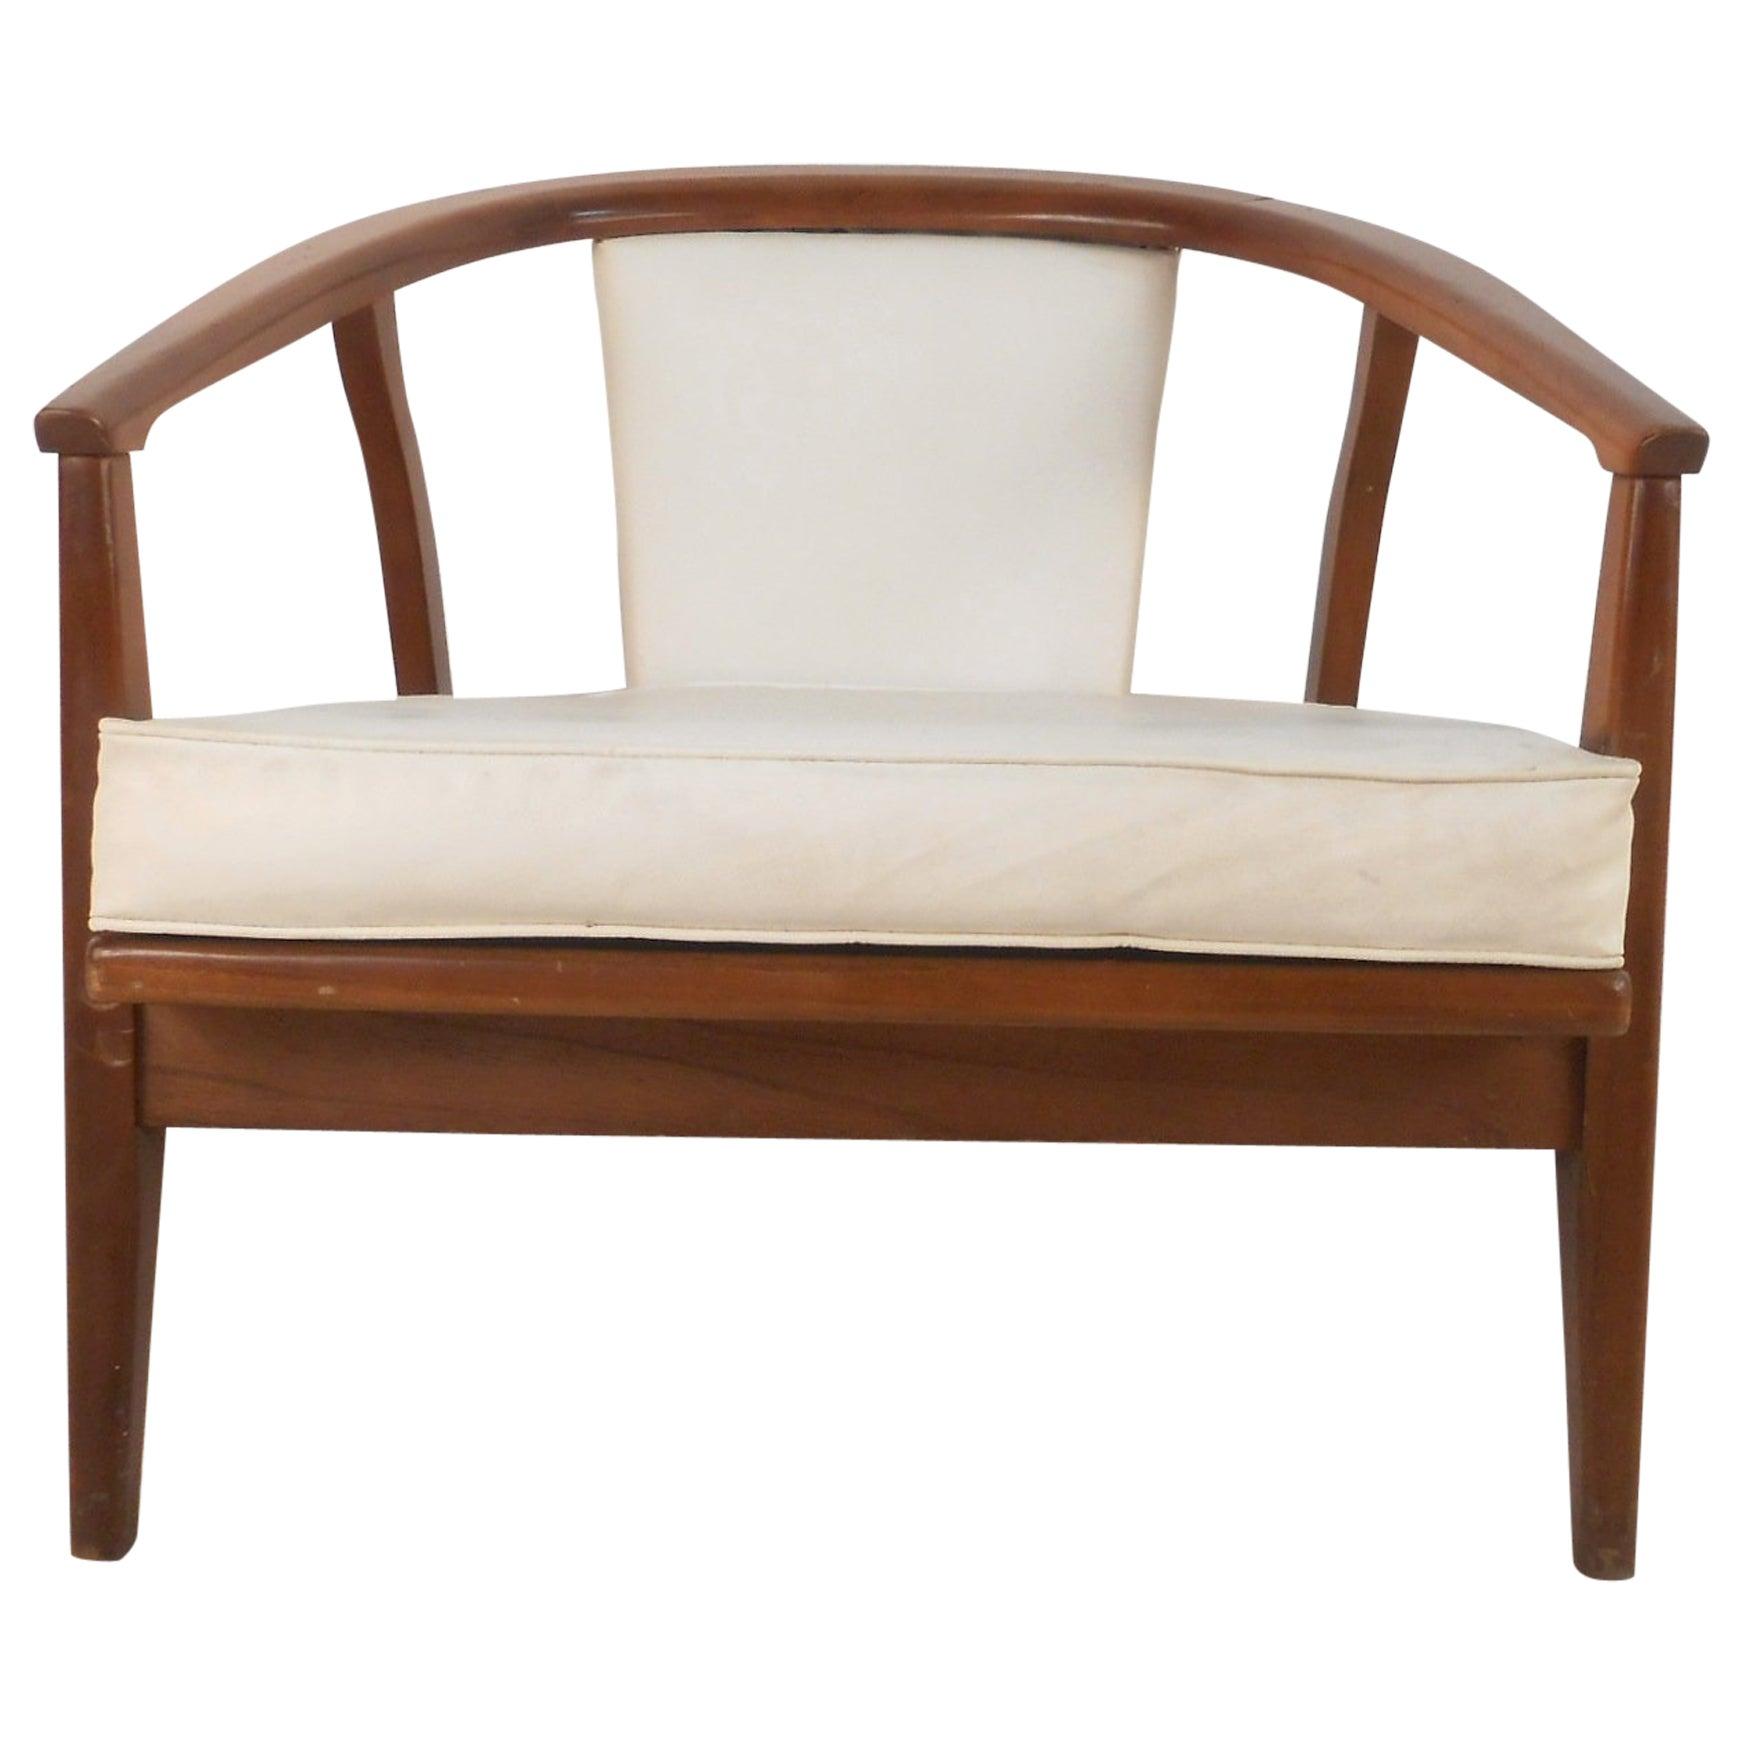 Unique Mid-Century Modern Barrel Back Side Chair